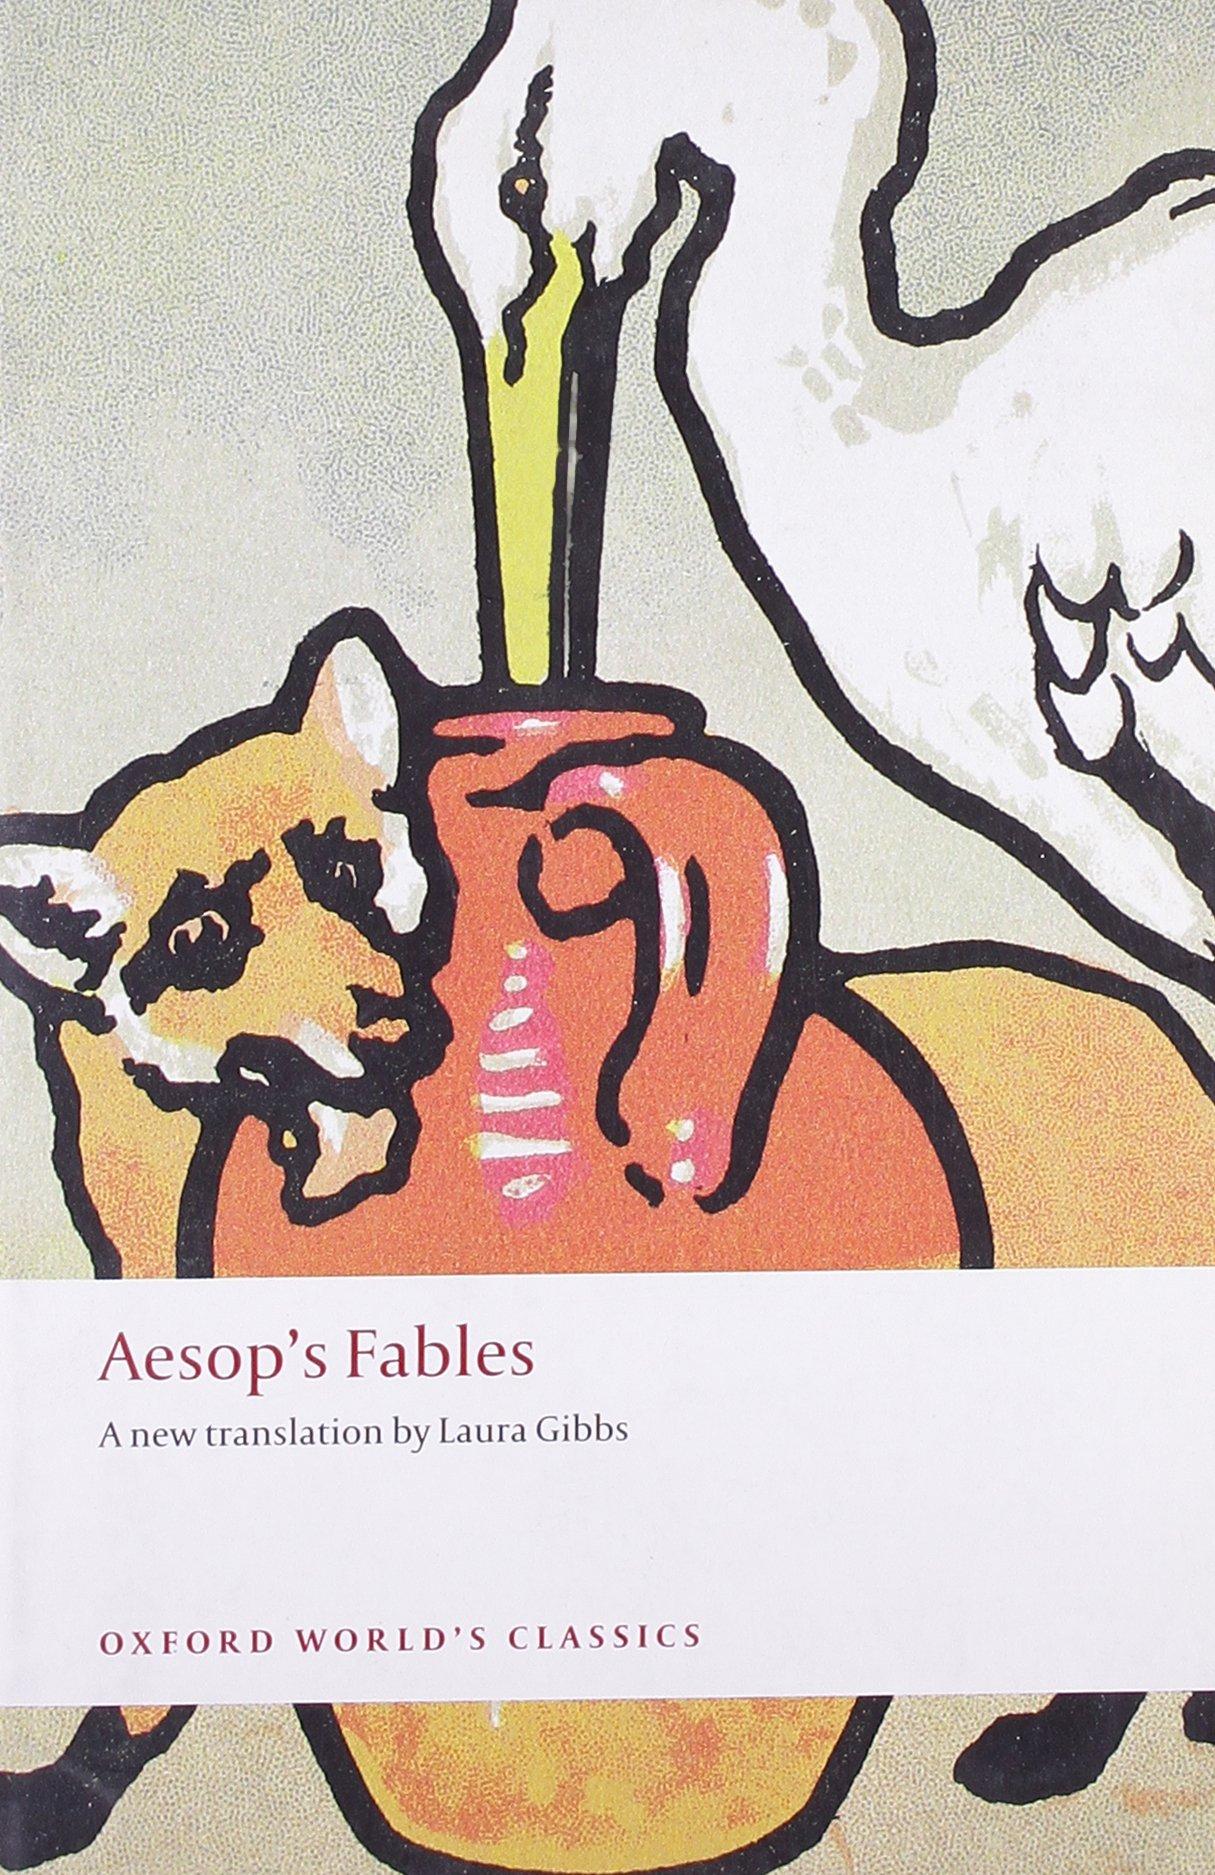 Aesop fables essay for literature Studentnis org